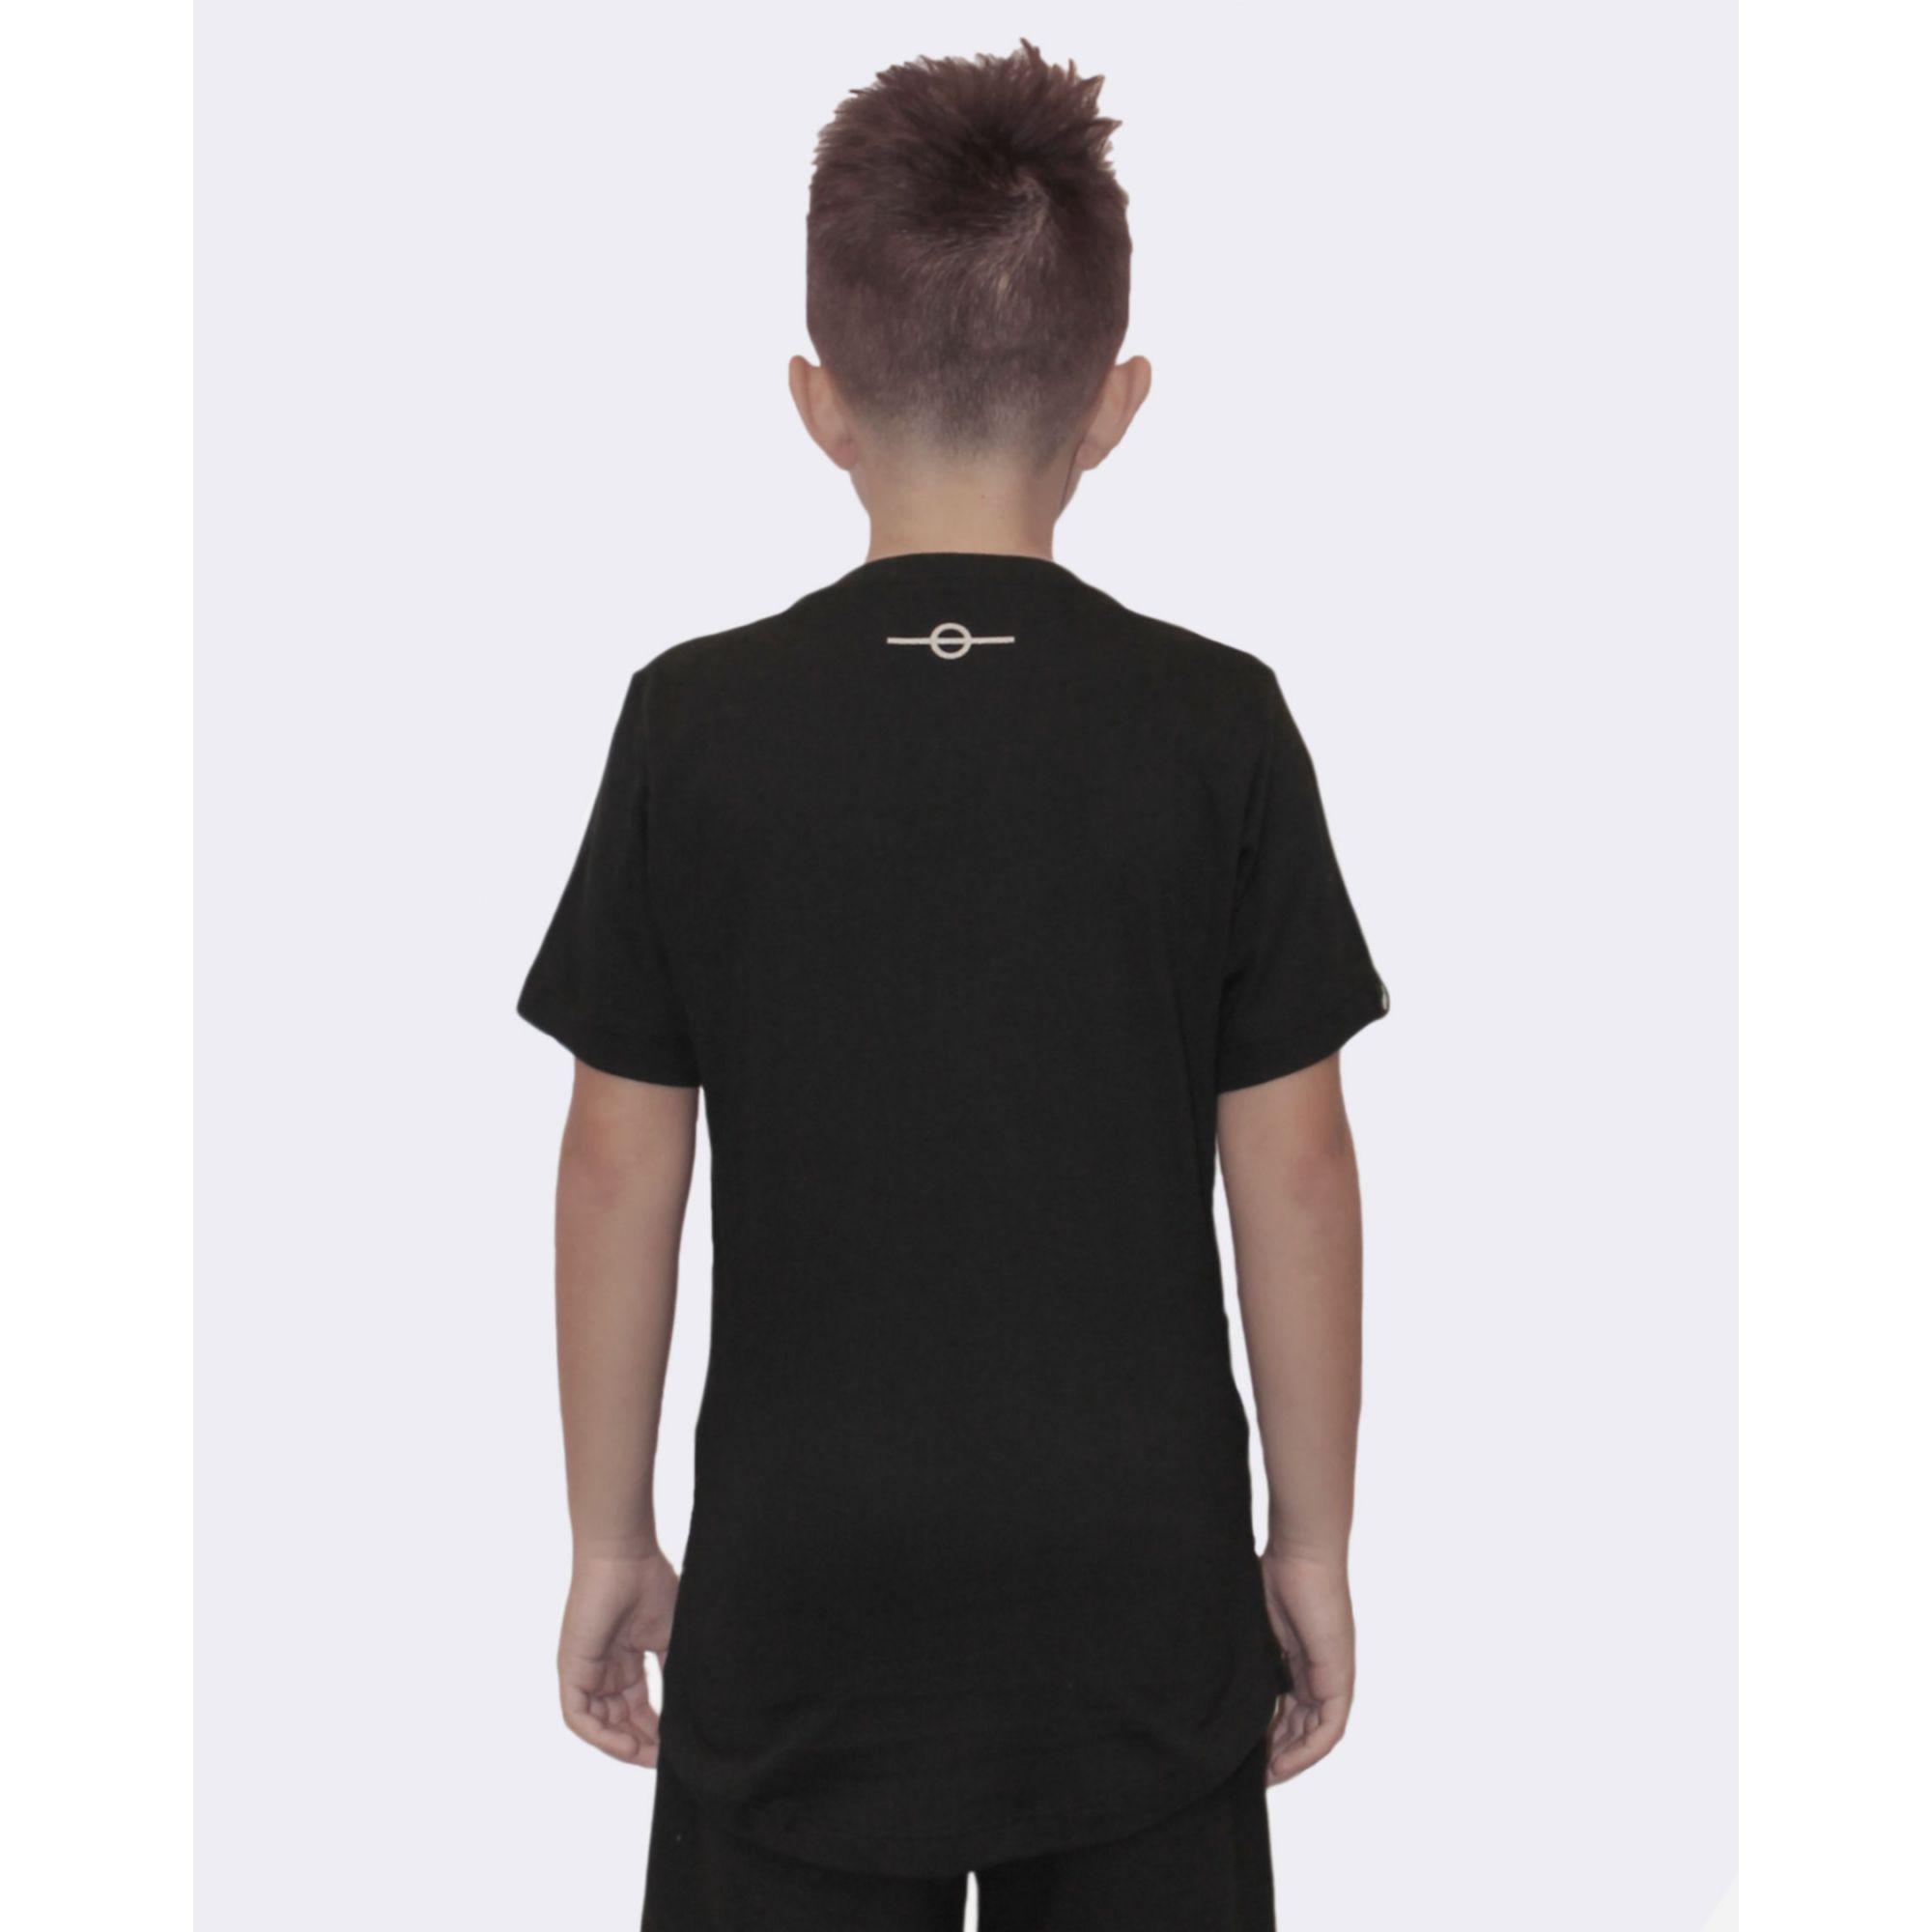 Camiseta Buh Kids Outline Black